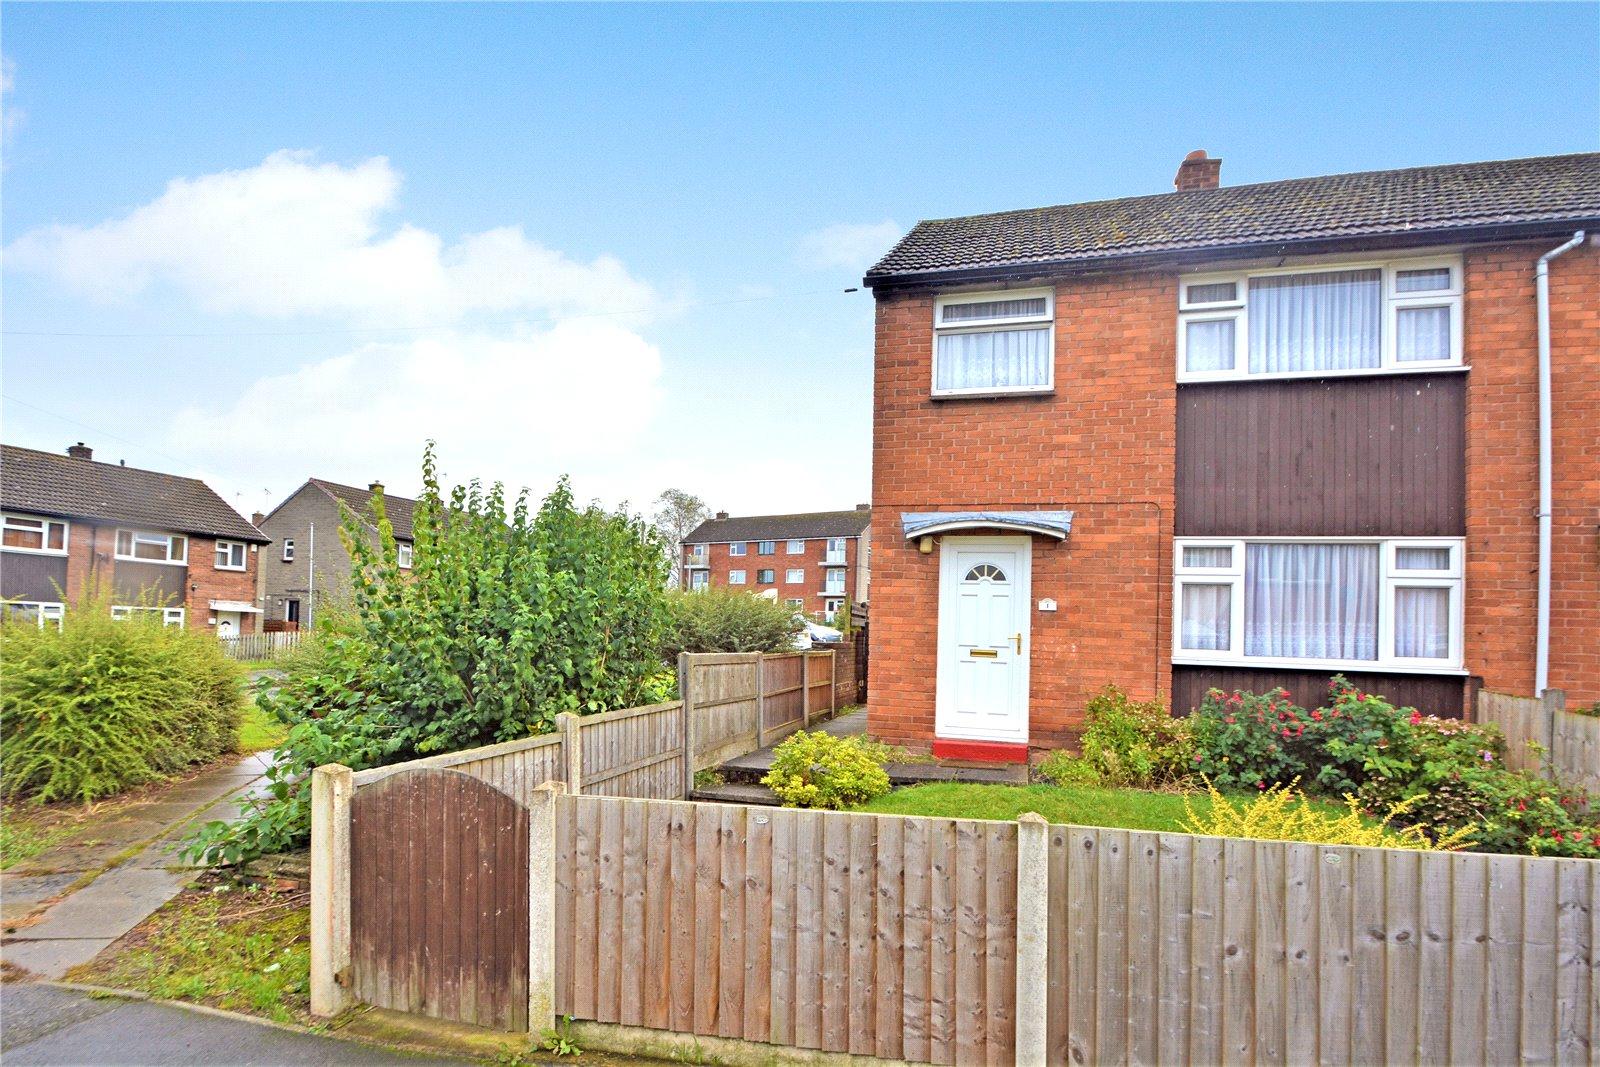 1 Poplar Close, Madeley, Telford, Shropshire, TF7